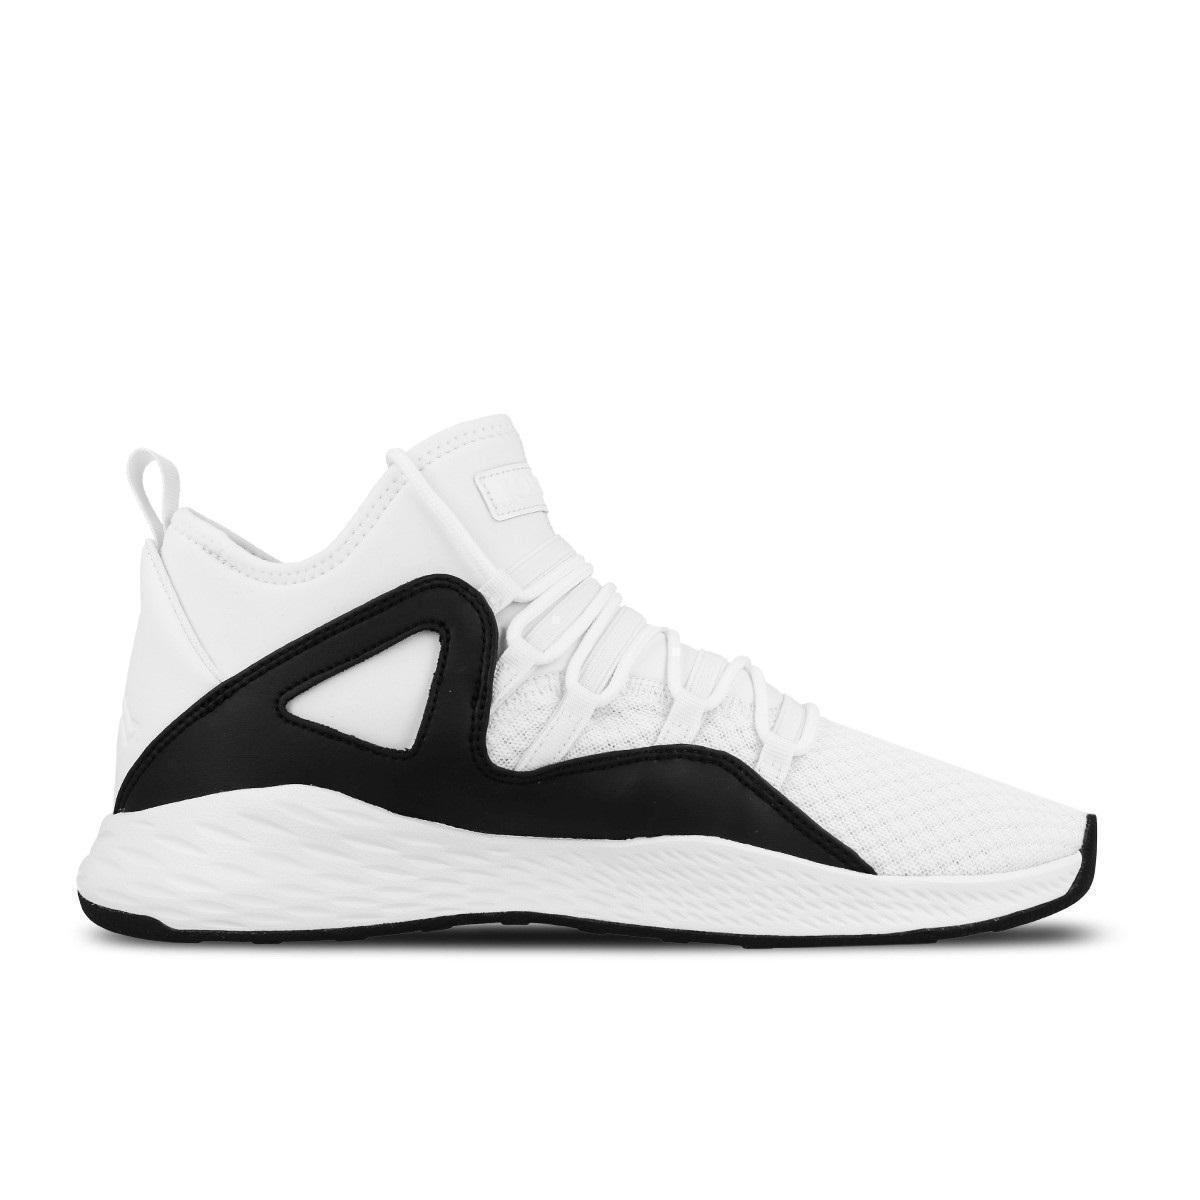 Da Uomo Nike Jordan Formula 23 Bianco/Nero Basket Scarpe da ginnastica 881465 100 (25) Scarpe classiche da uomo